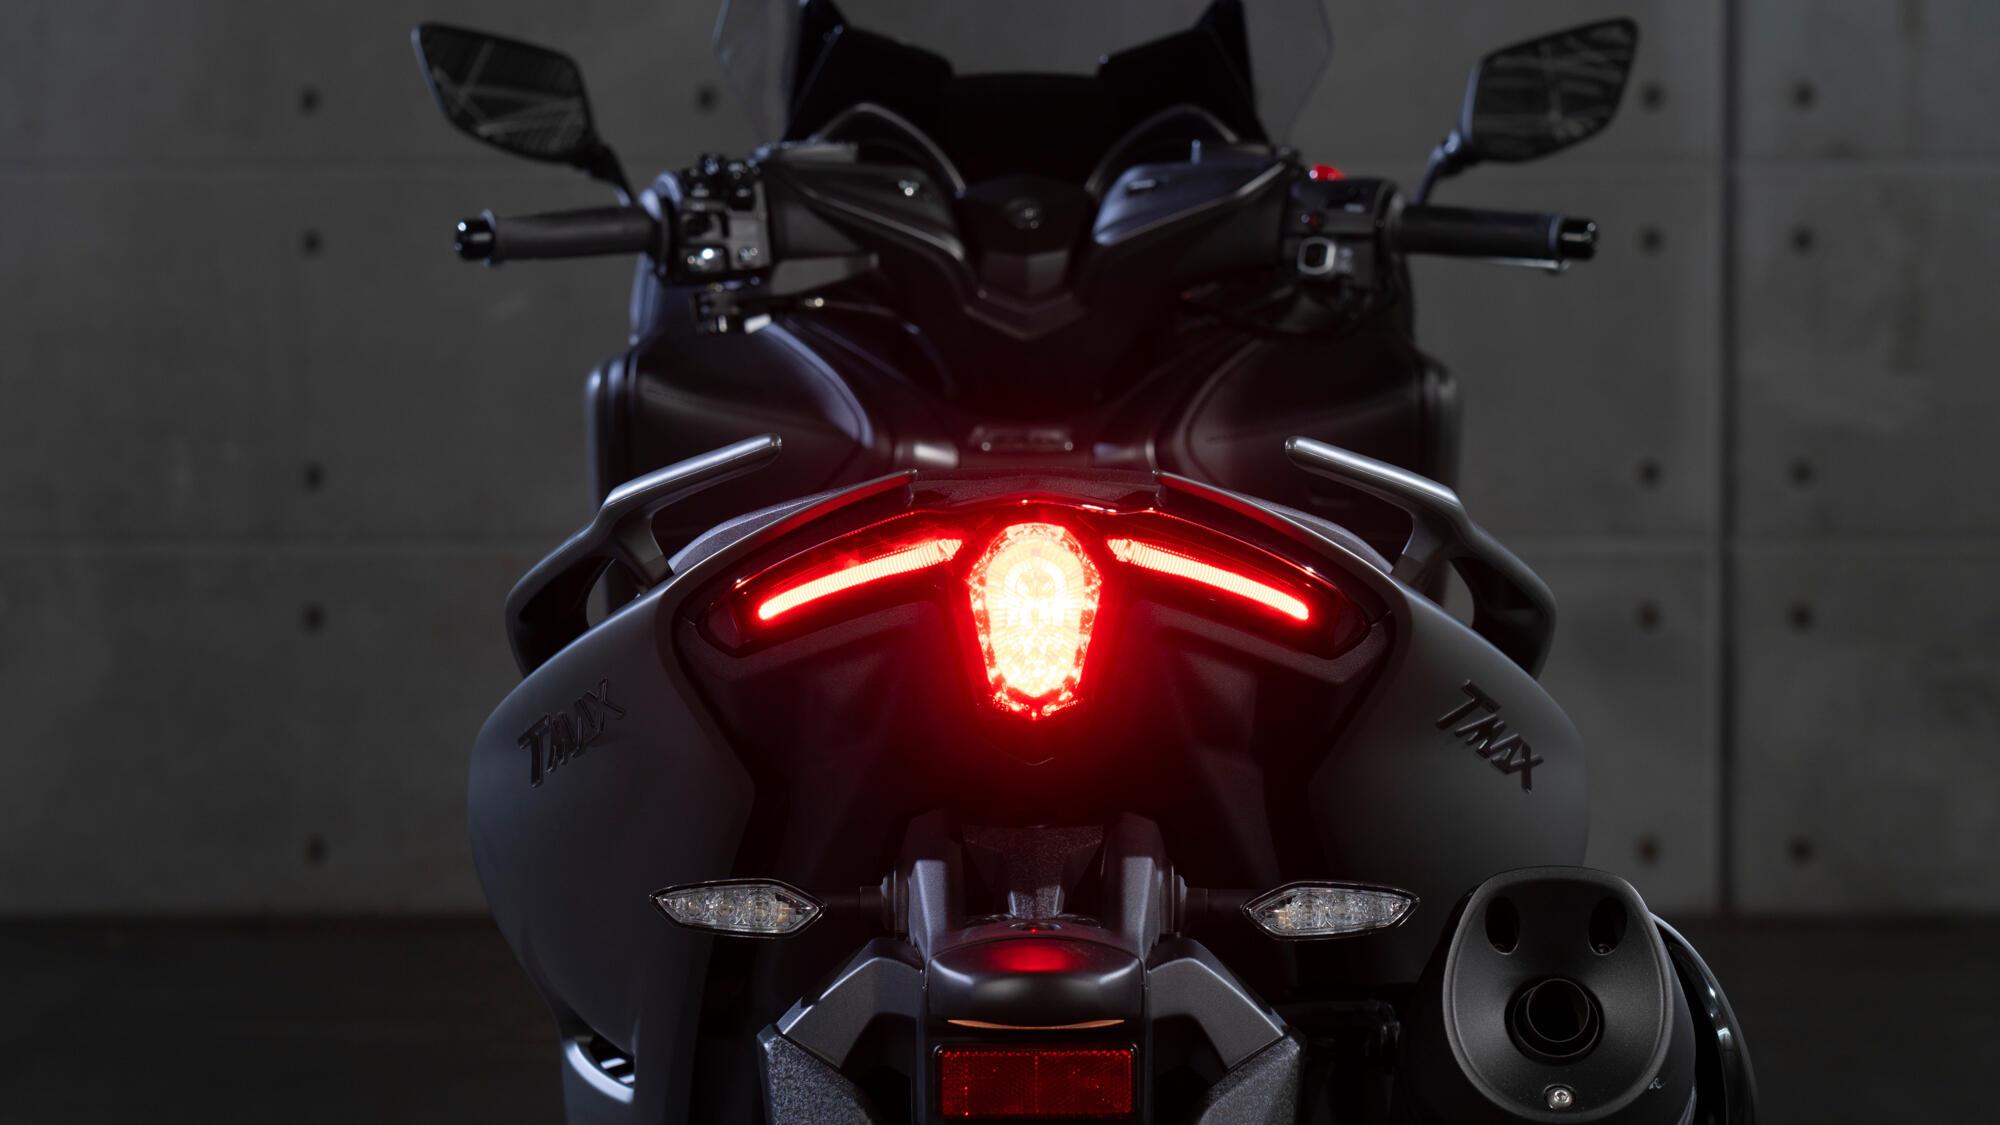 yamaha tmax tech max 2020 dizajn agersivni i dinamicni